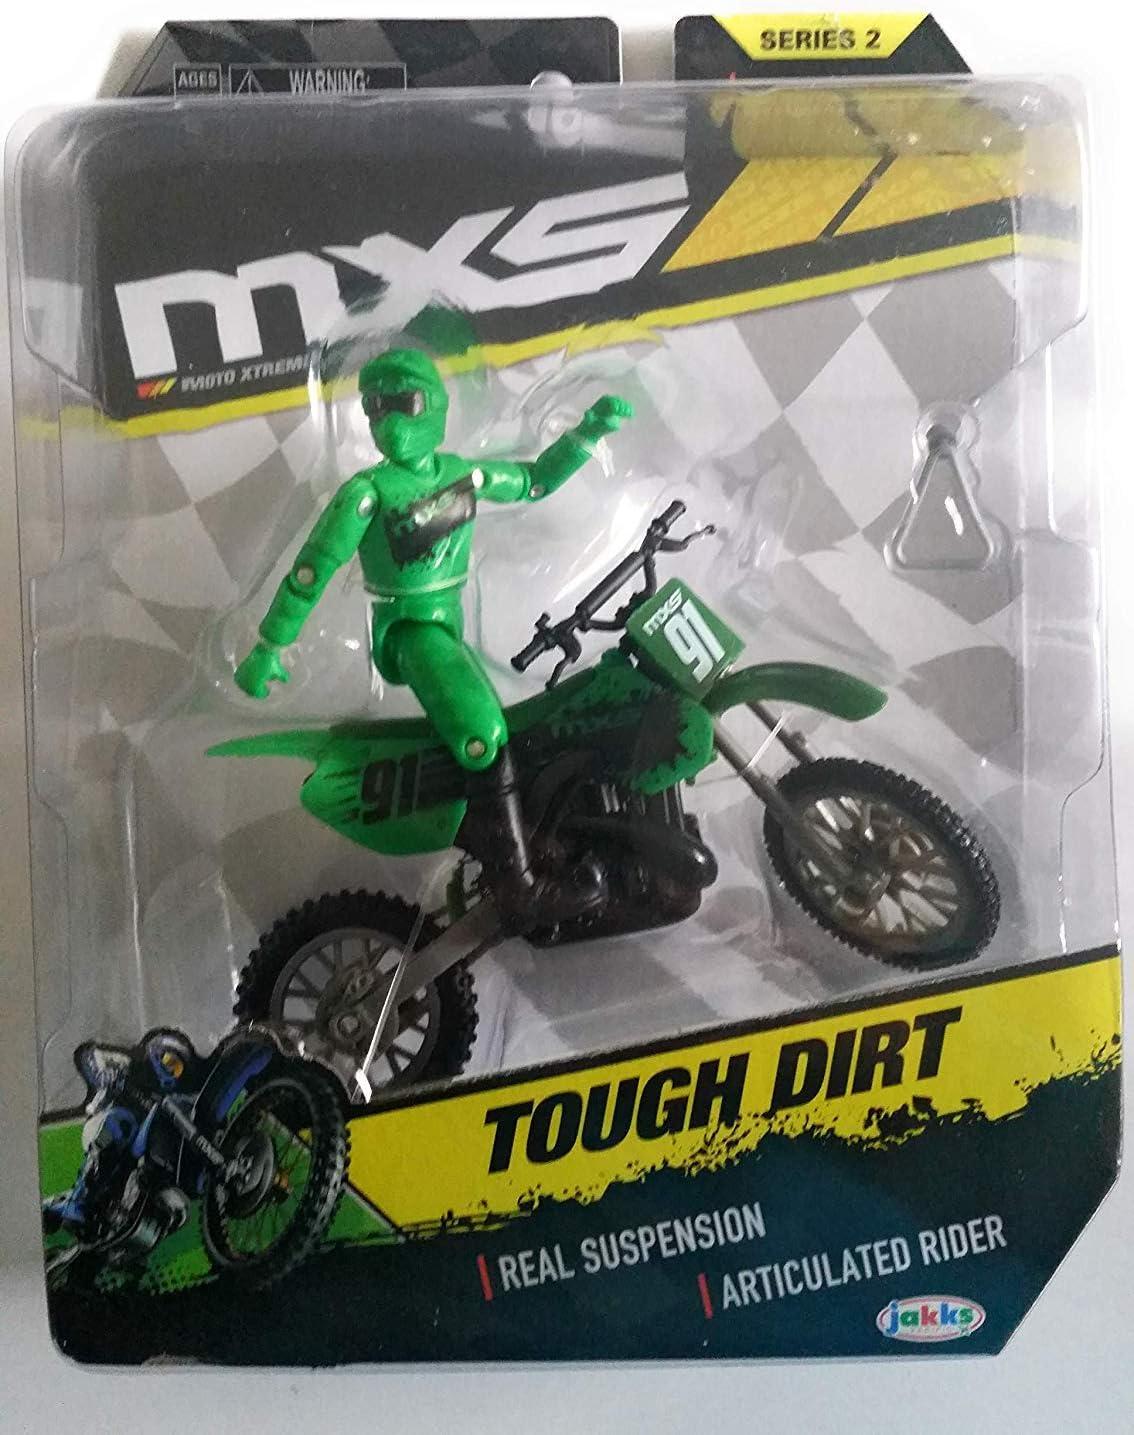 MXS Tough Dirt Moto Extreme Sports シリーズ2